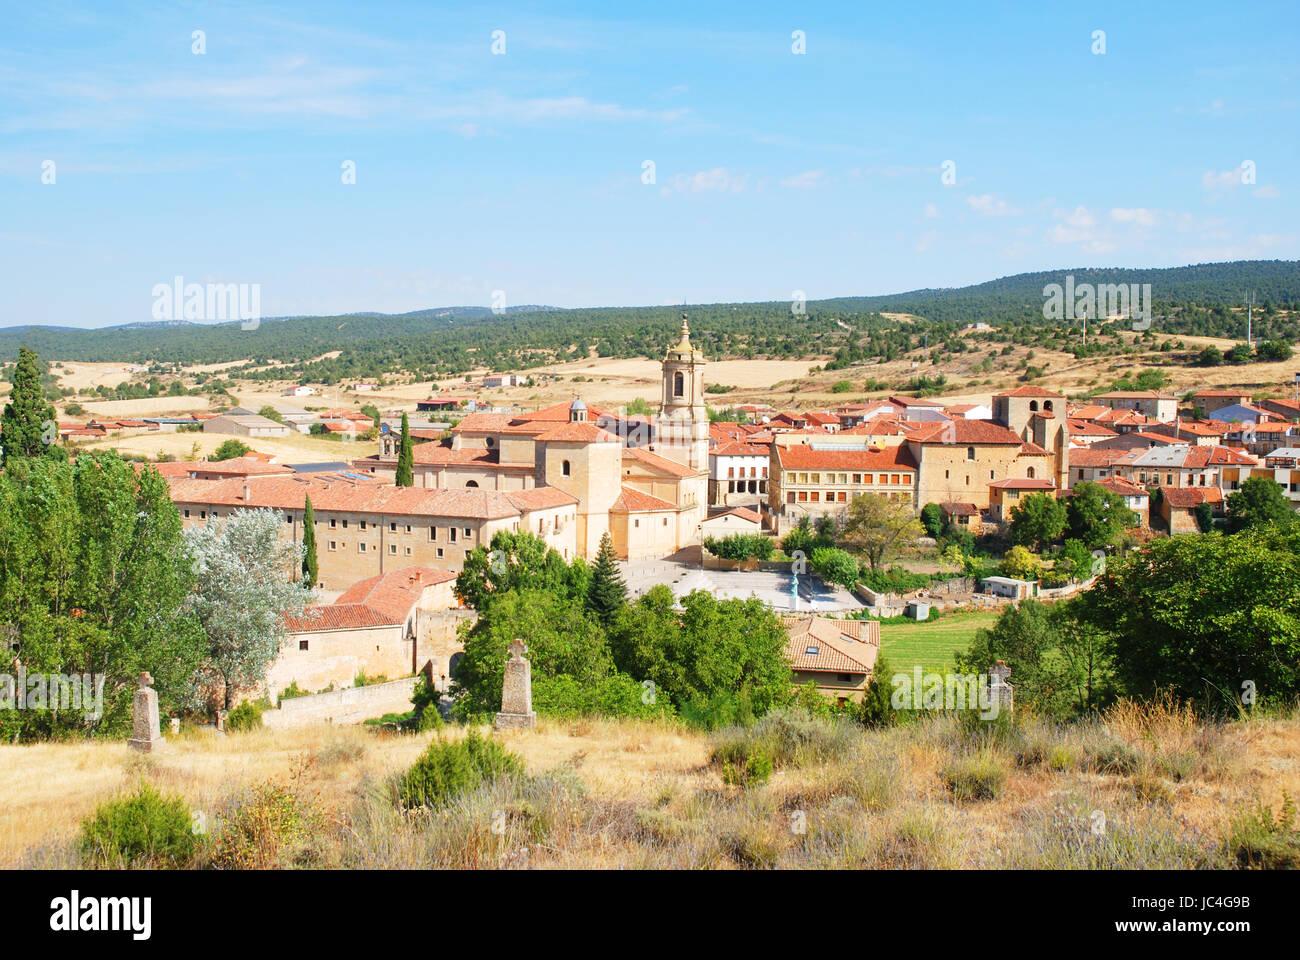 Overview of the village. Santo Domingo de Silos, Burgos province, Castilla Leon, Spain. - Stock Image